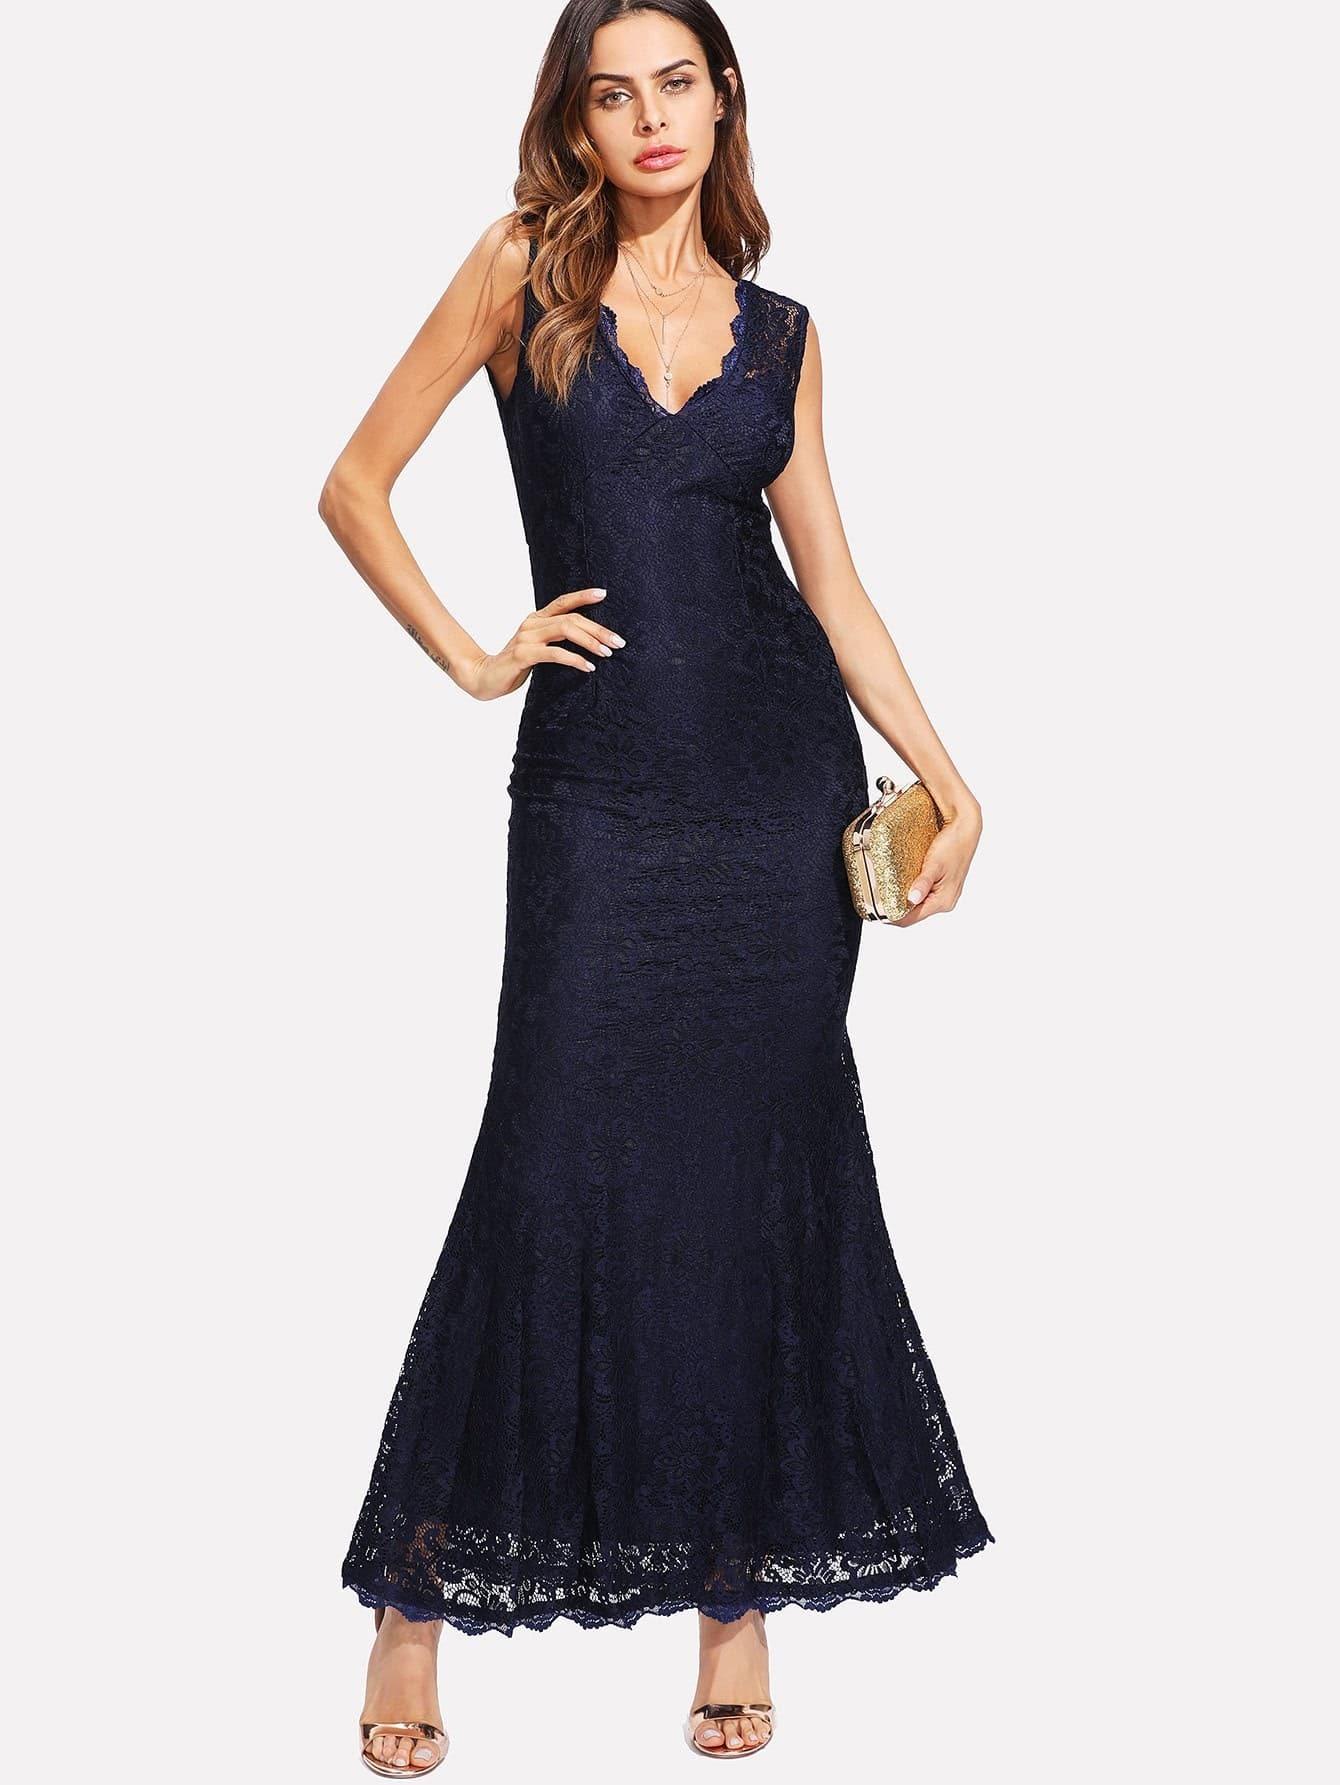 Scallop Trim Lace Dress